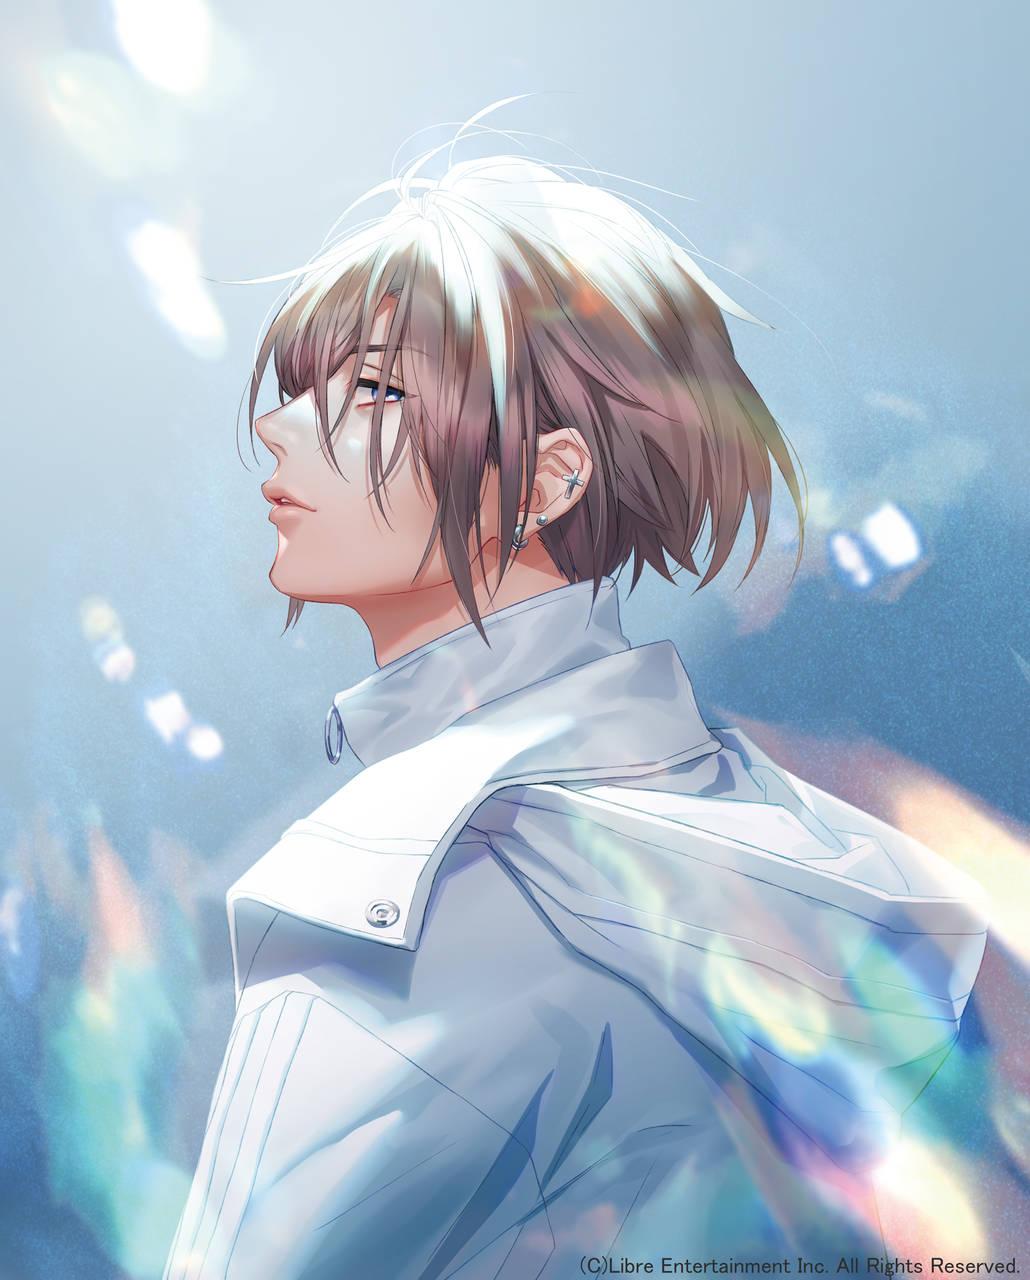 『A3!』のキャラクターデザインを手掛ける冨士原良、初の画集発売決定!2